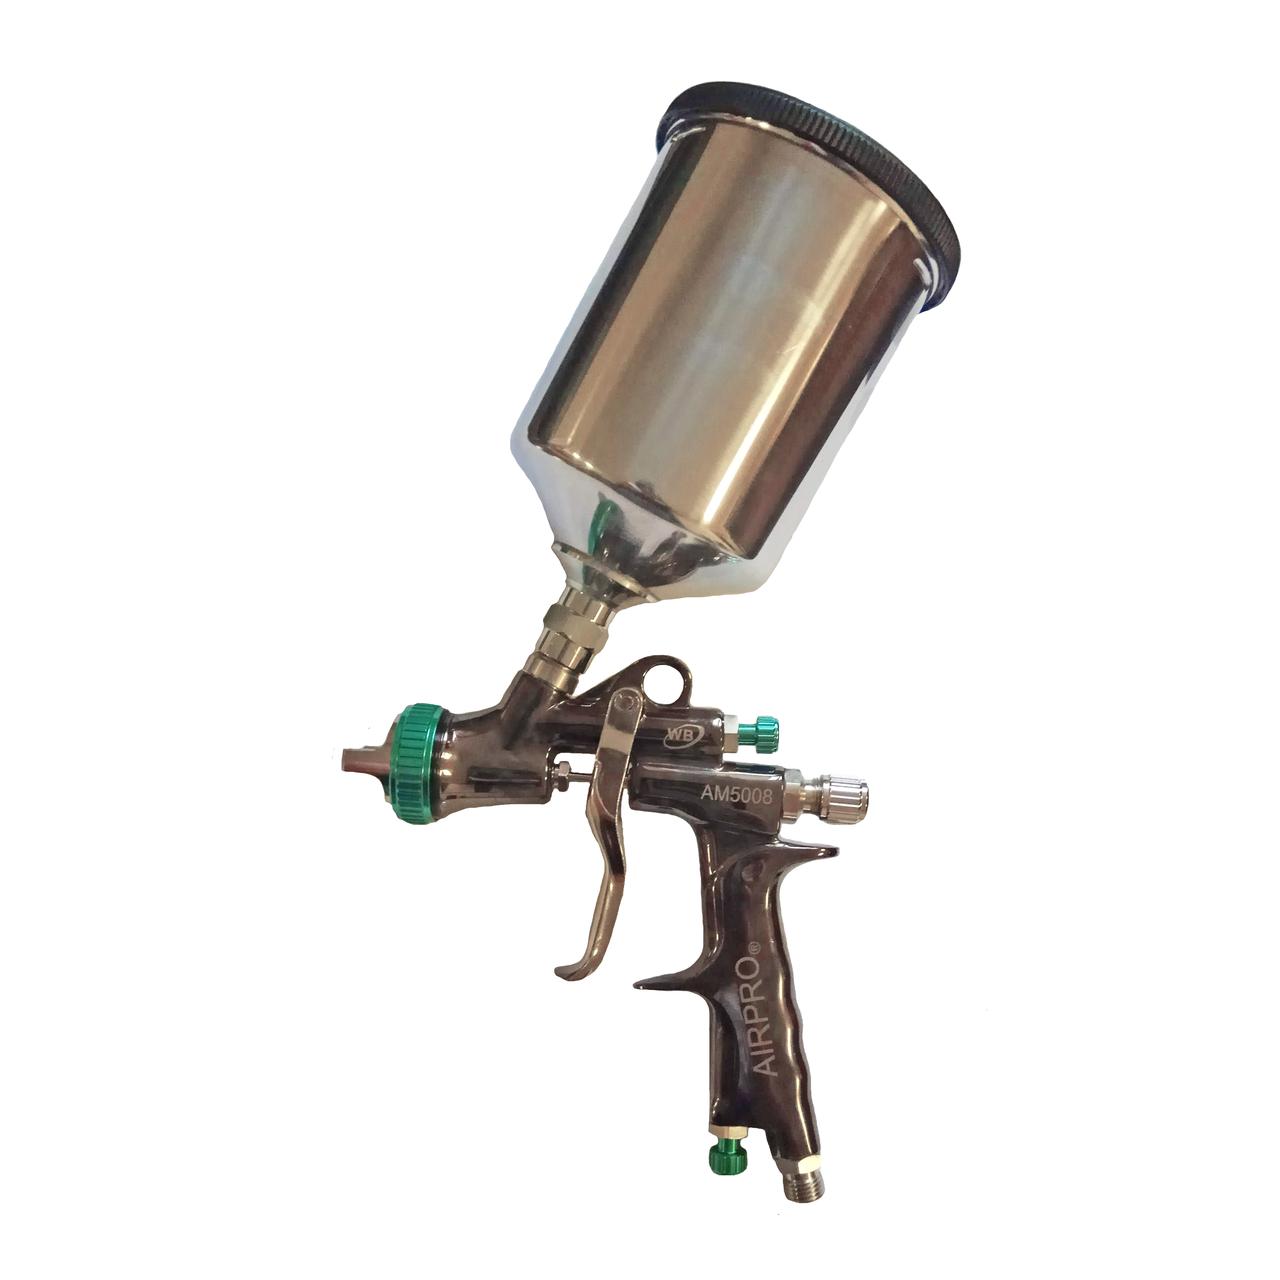 Краскопульт пневматический Air Pro AM5008 HVLP WB PLUS-AL (1,8 мм)